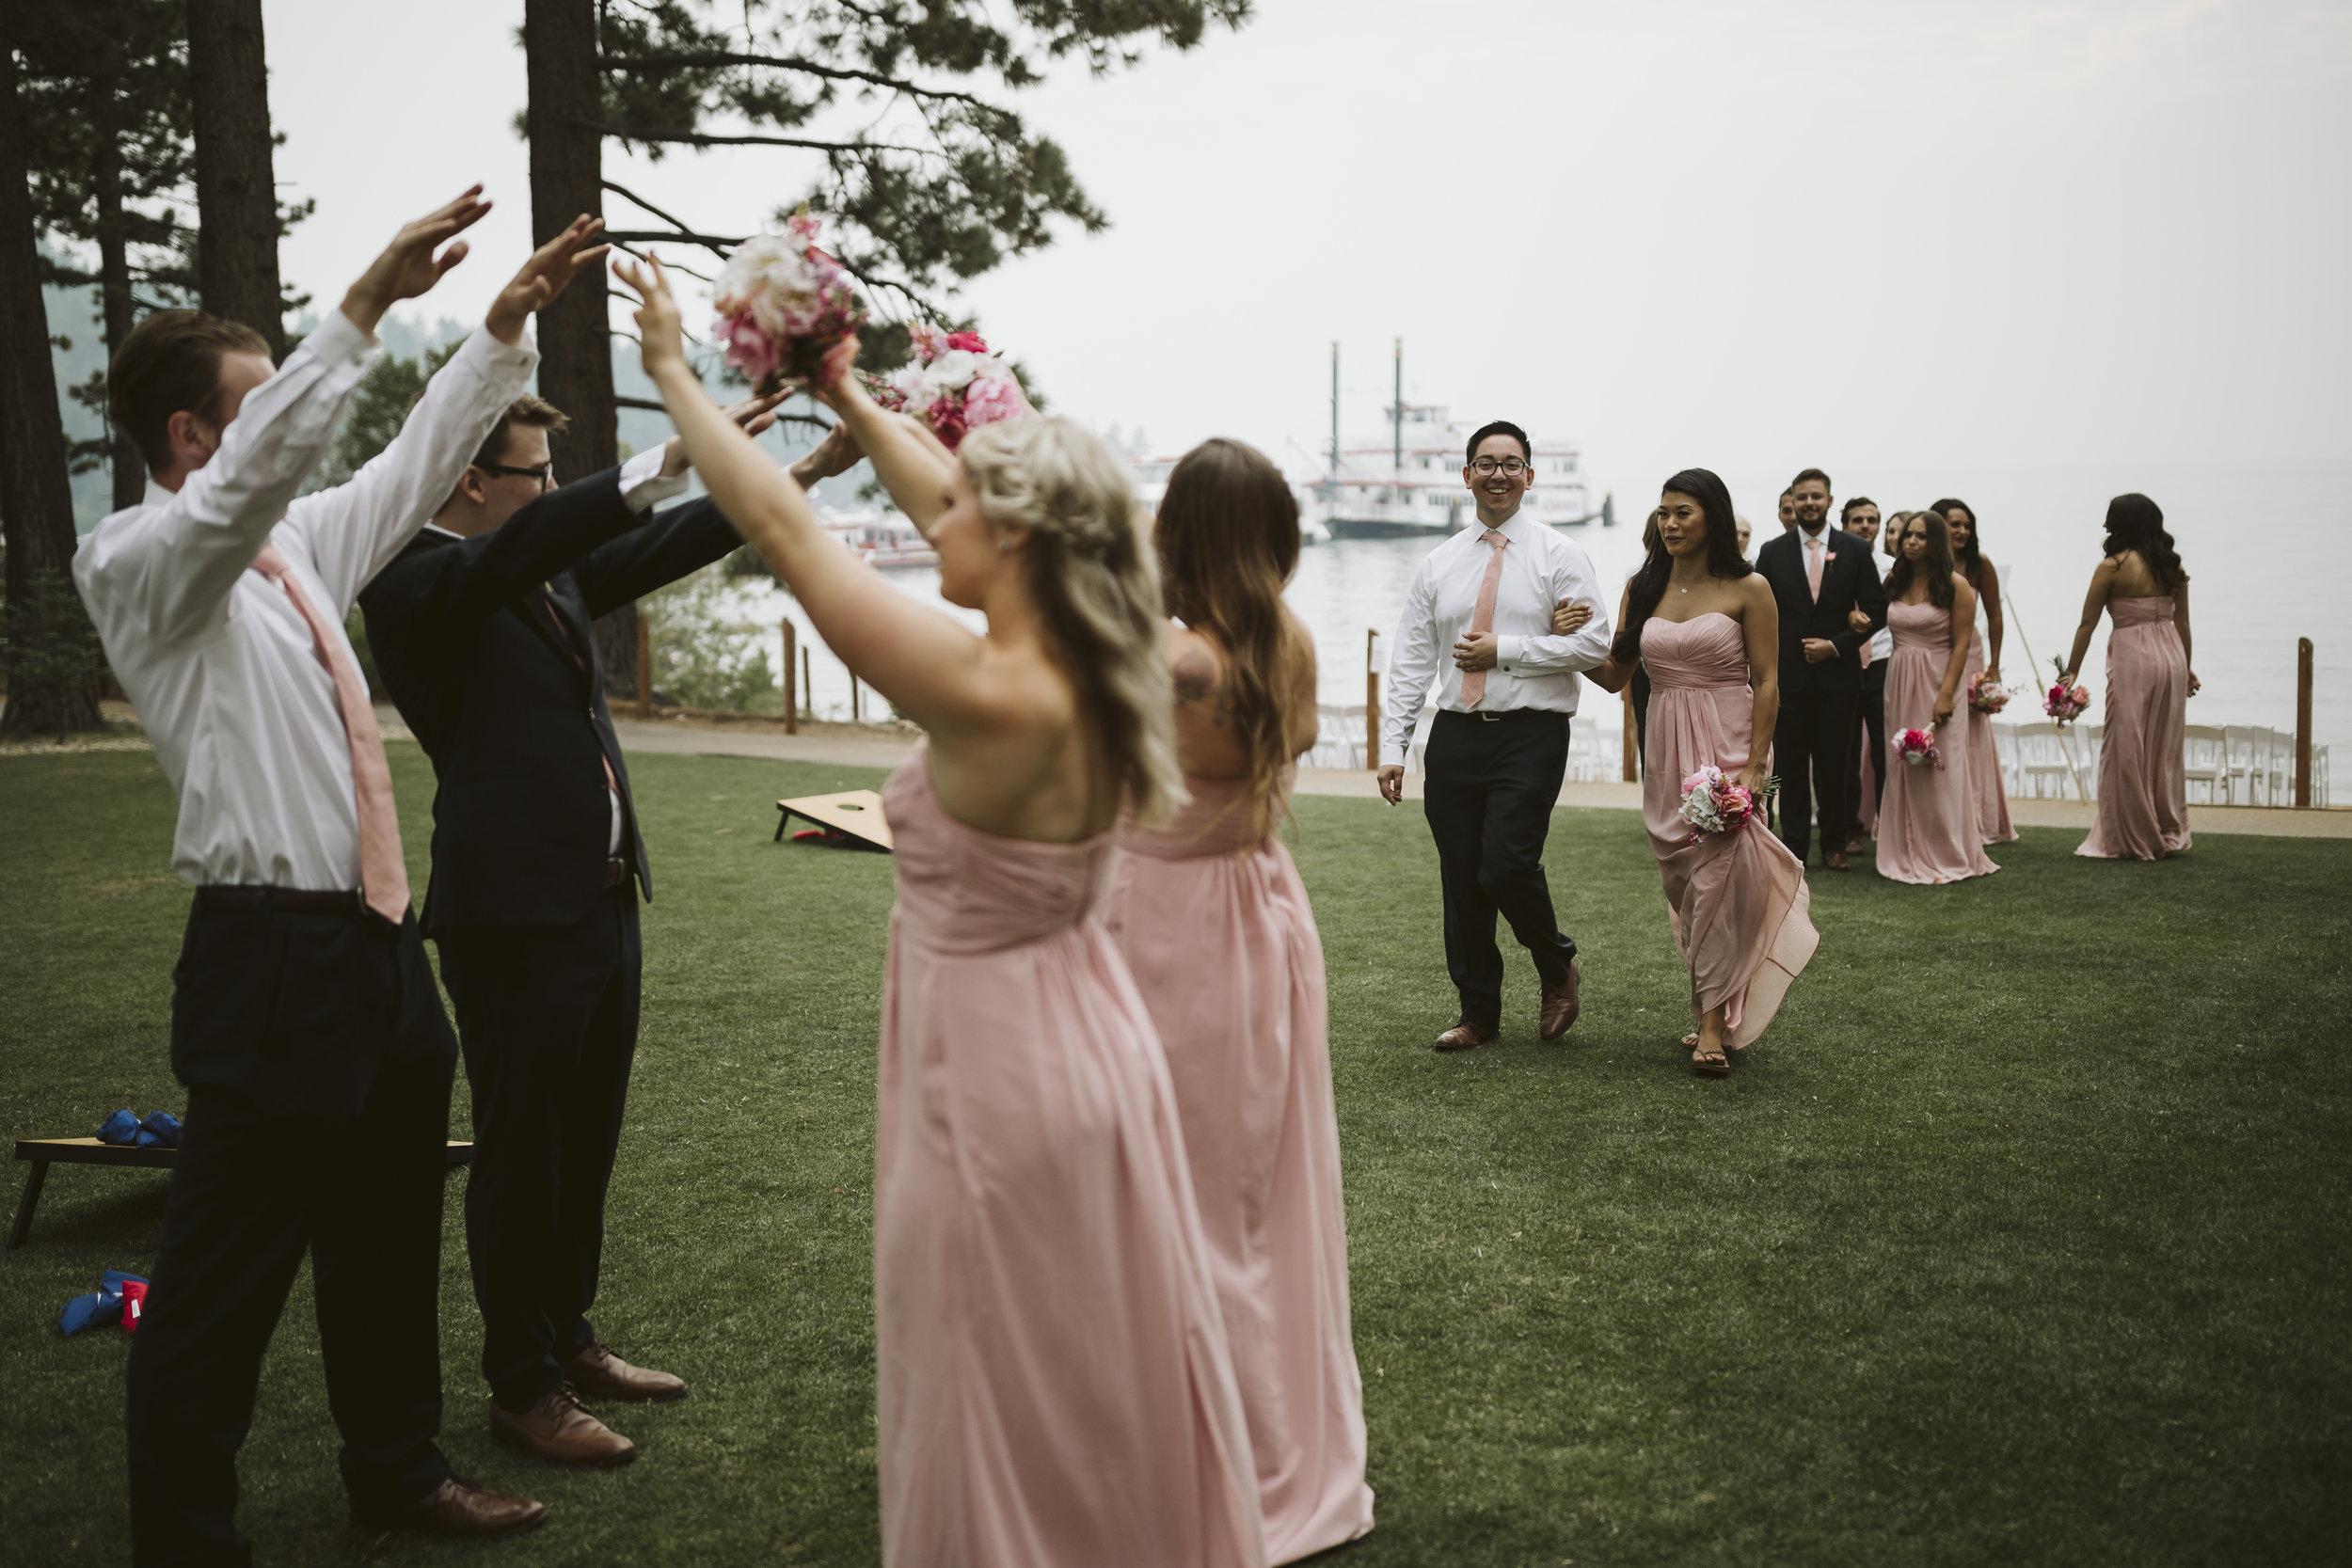 _M7A2614vild-vild photography-photography-wedding-wedding photography-tahoe-lake tahoe-lake tahoe wedding photographer-nevada wedding photographer-mountain wedding.jpg